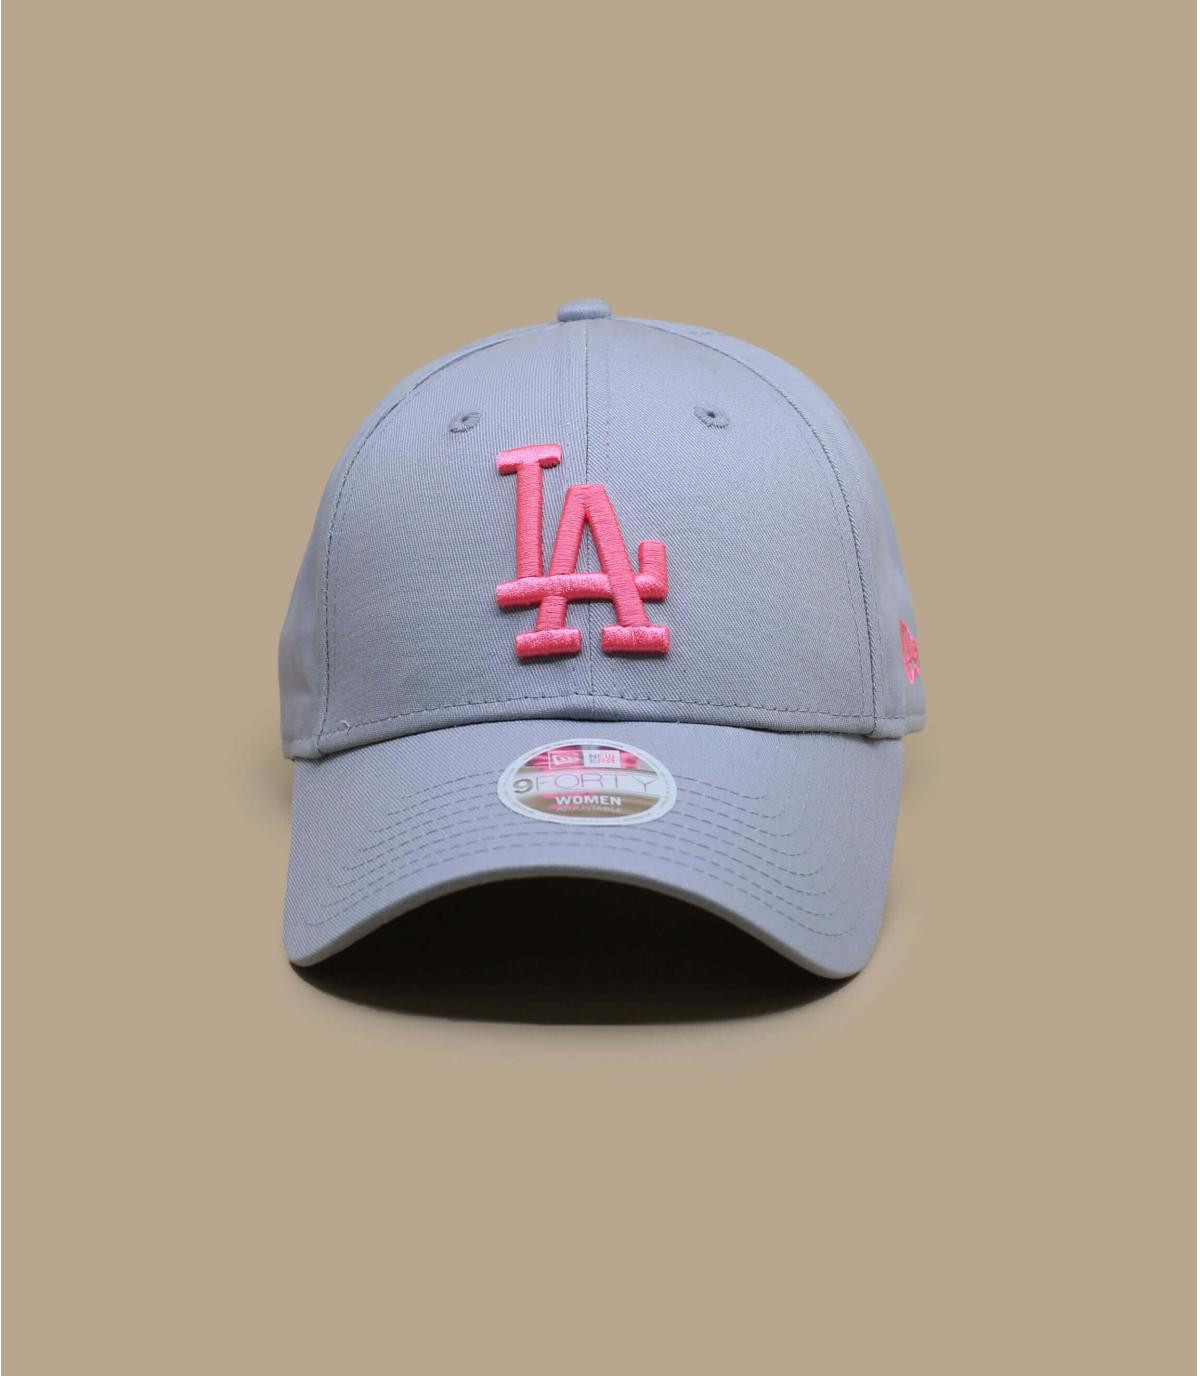 Detalles Wmn League Ess LA gray pink imagen 2